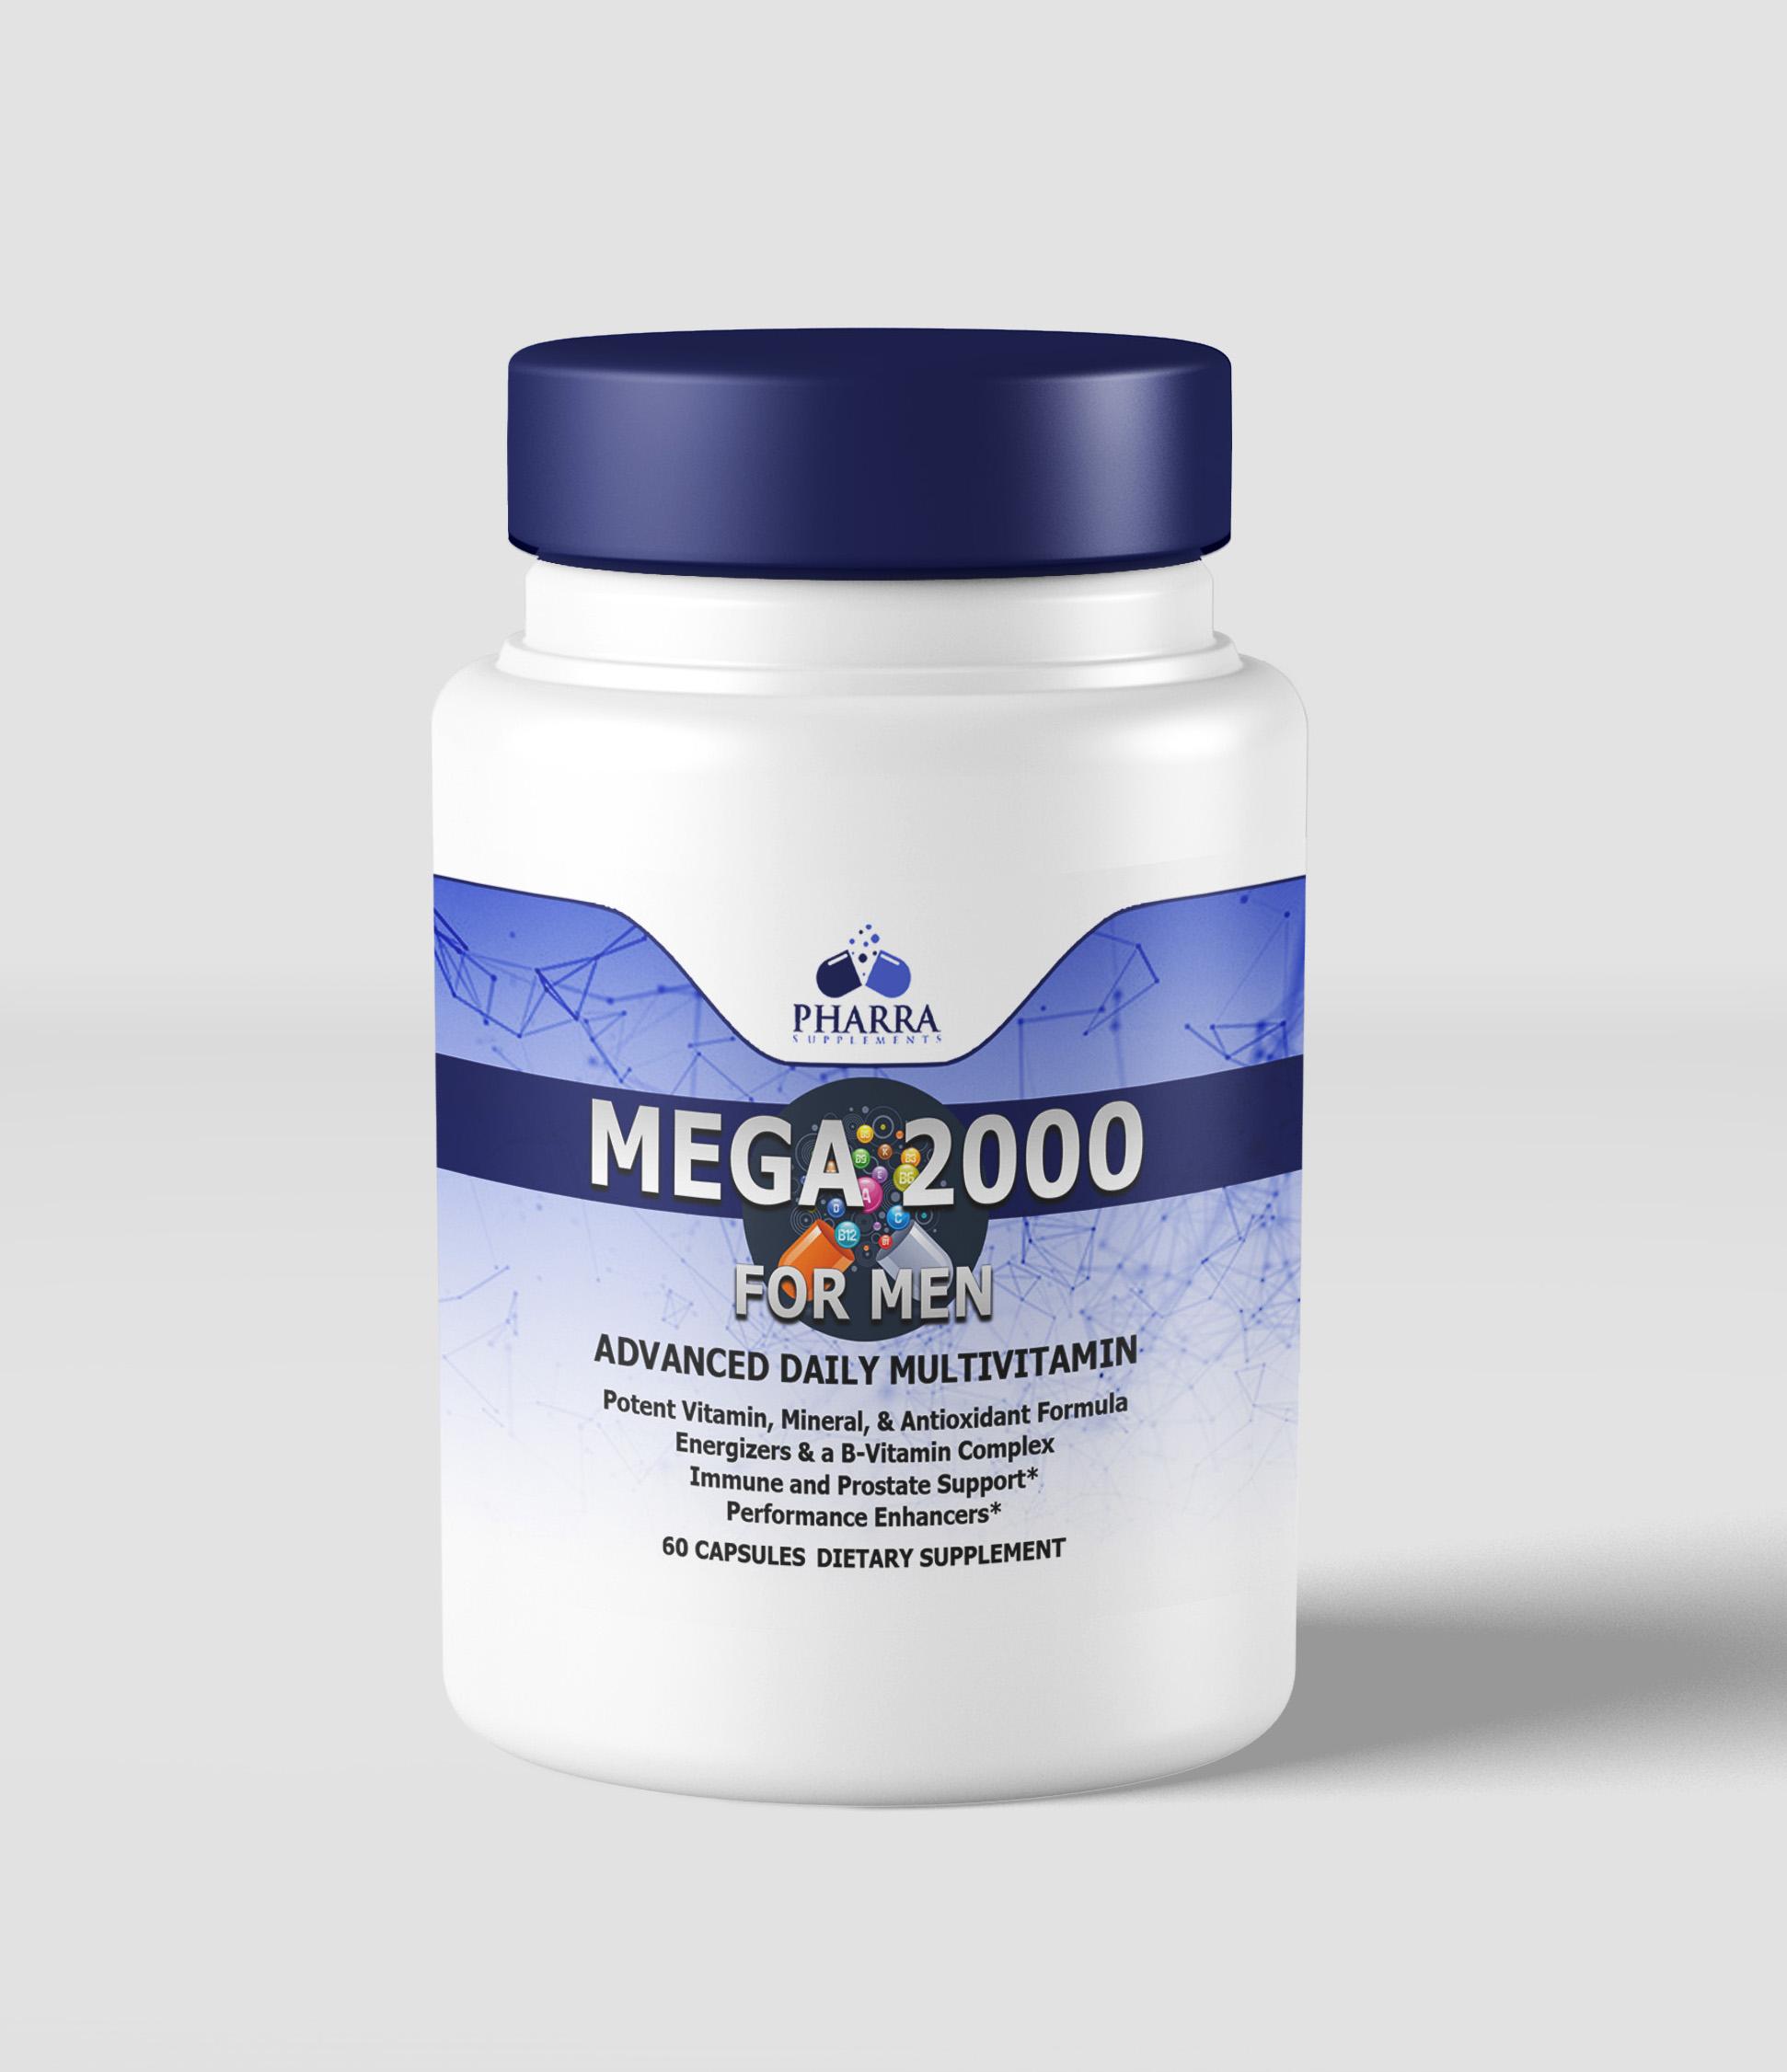 Mega 2000 For Men